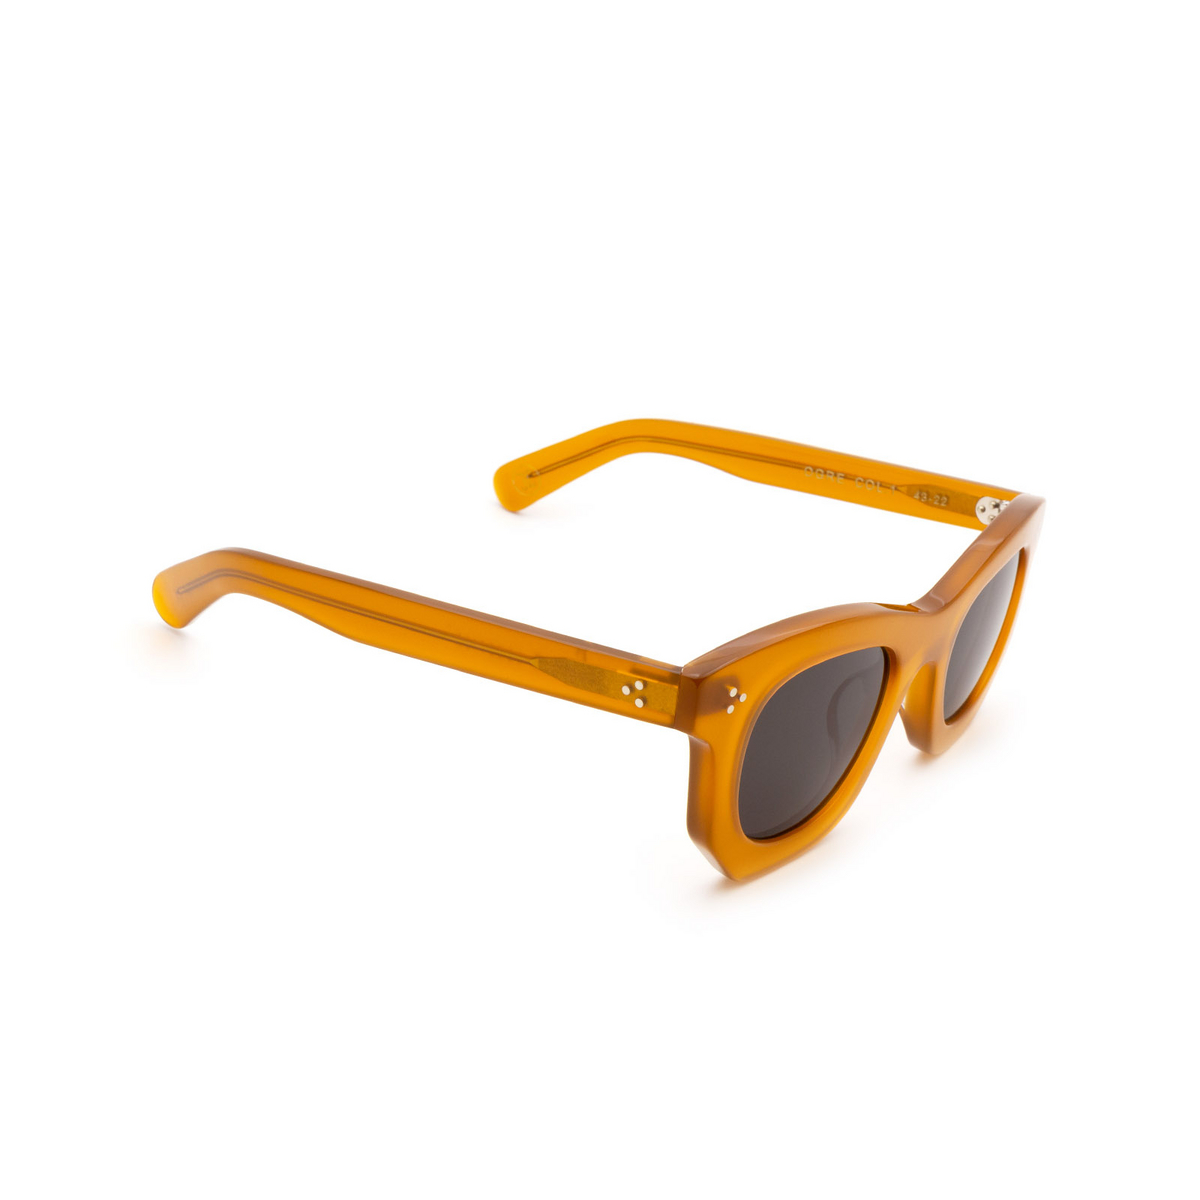 Lesca® Irregular Sunglasses: Ogre Sun color Honey 1 - three-quarters view.